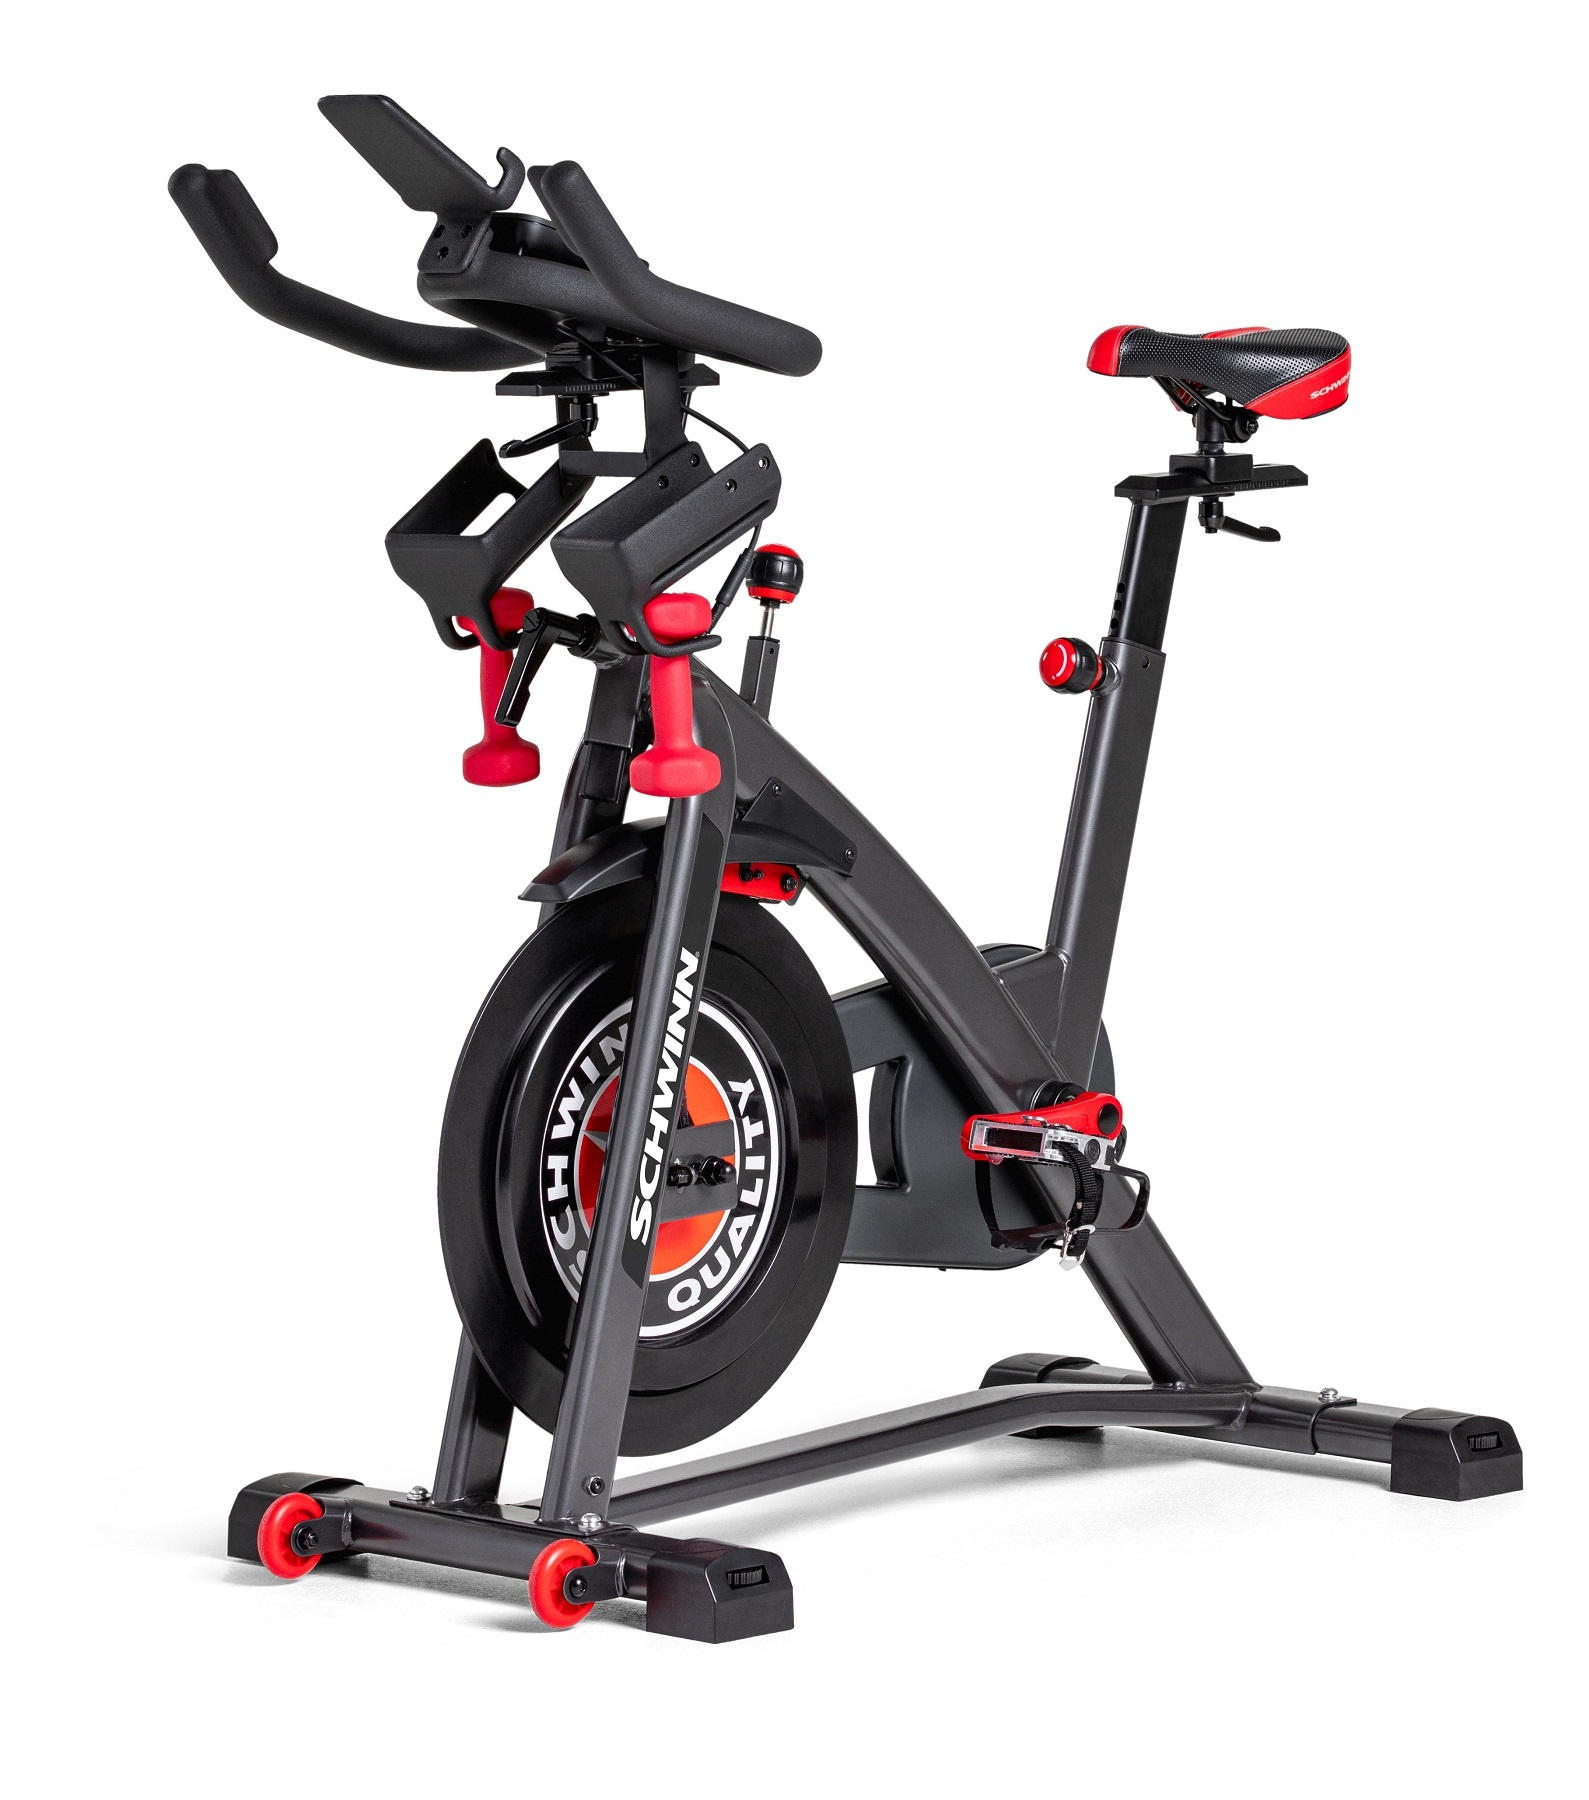 Schwinn IC8 Indoor Cycle - Spinningfiets - Gratis trainingsschema - Zwift Compatible